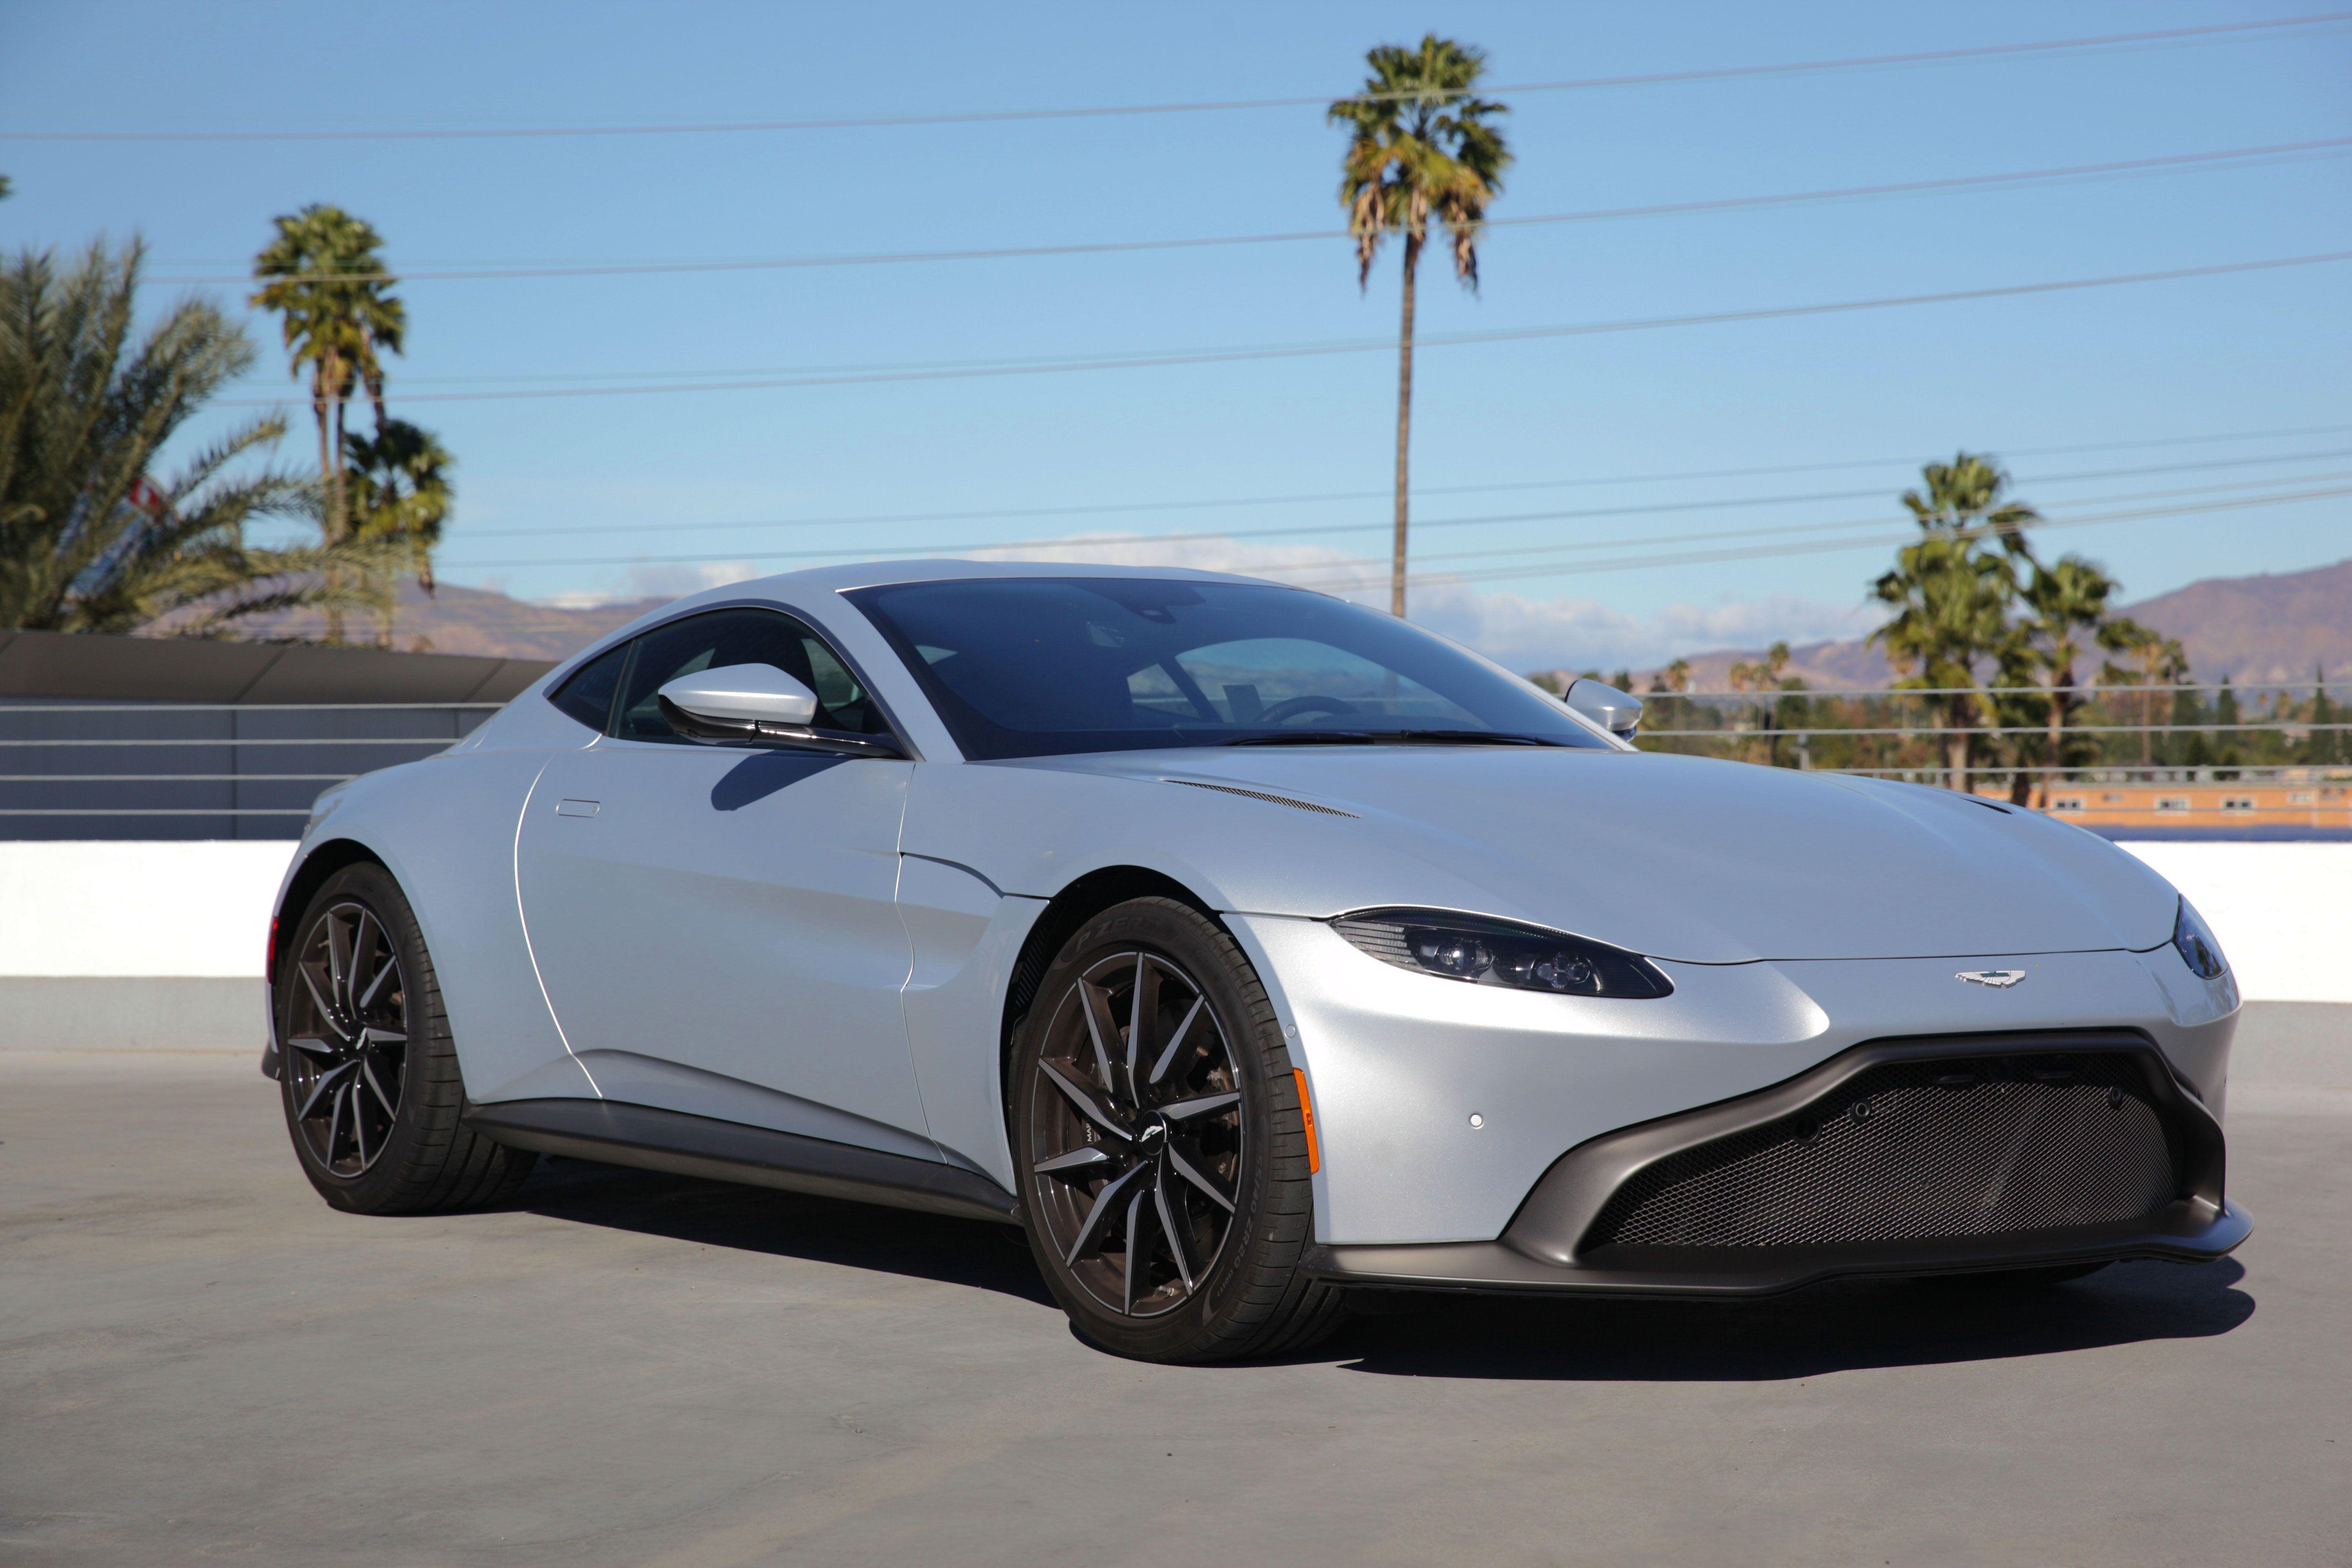 2020 GREY Aston Martin Vantage